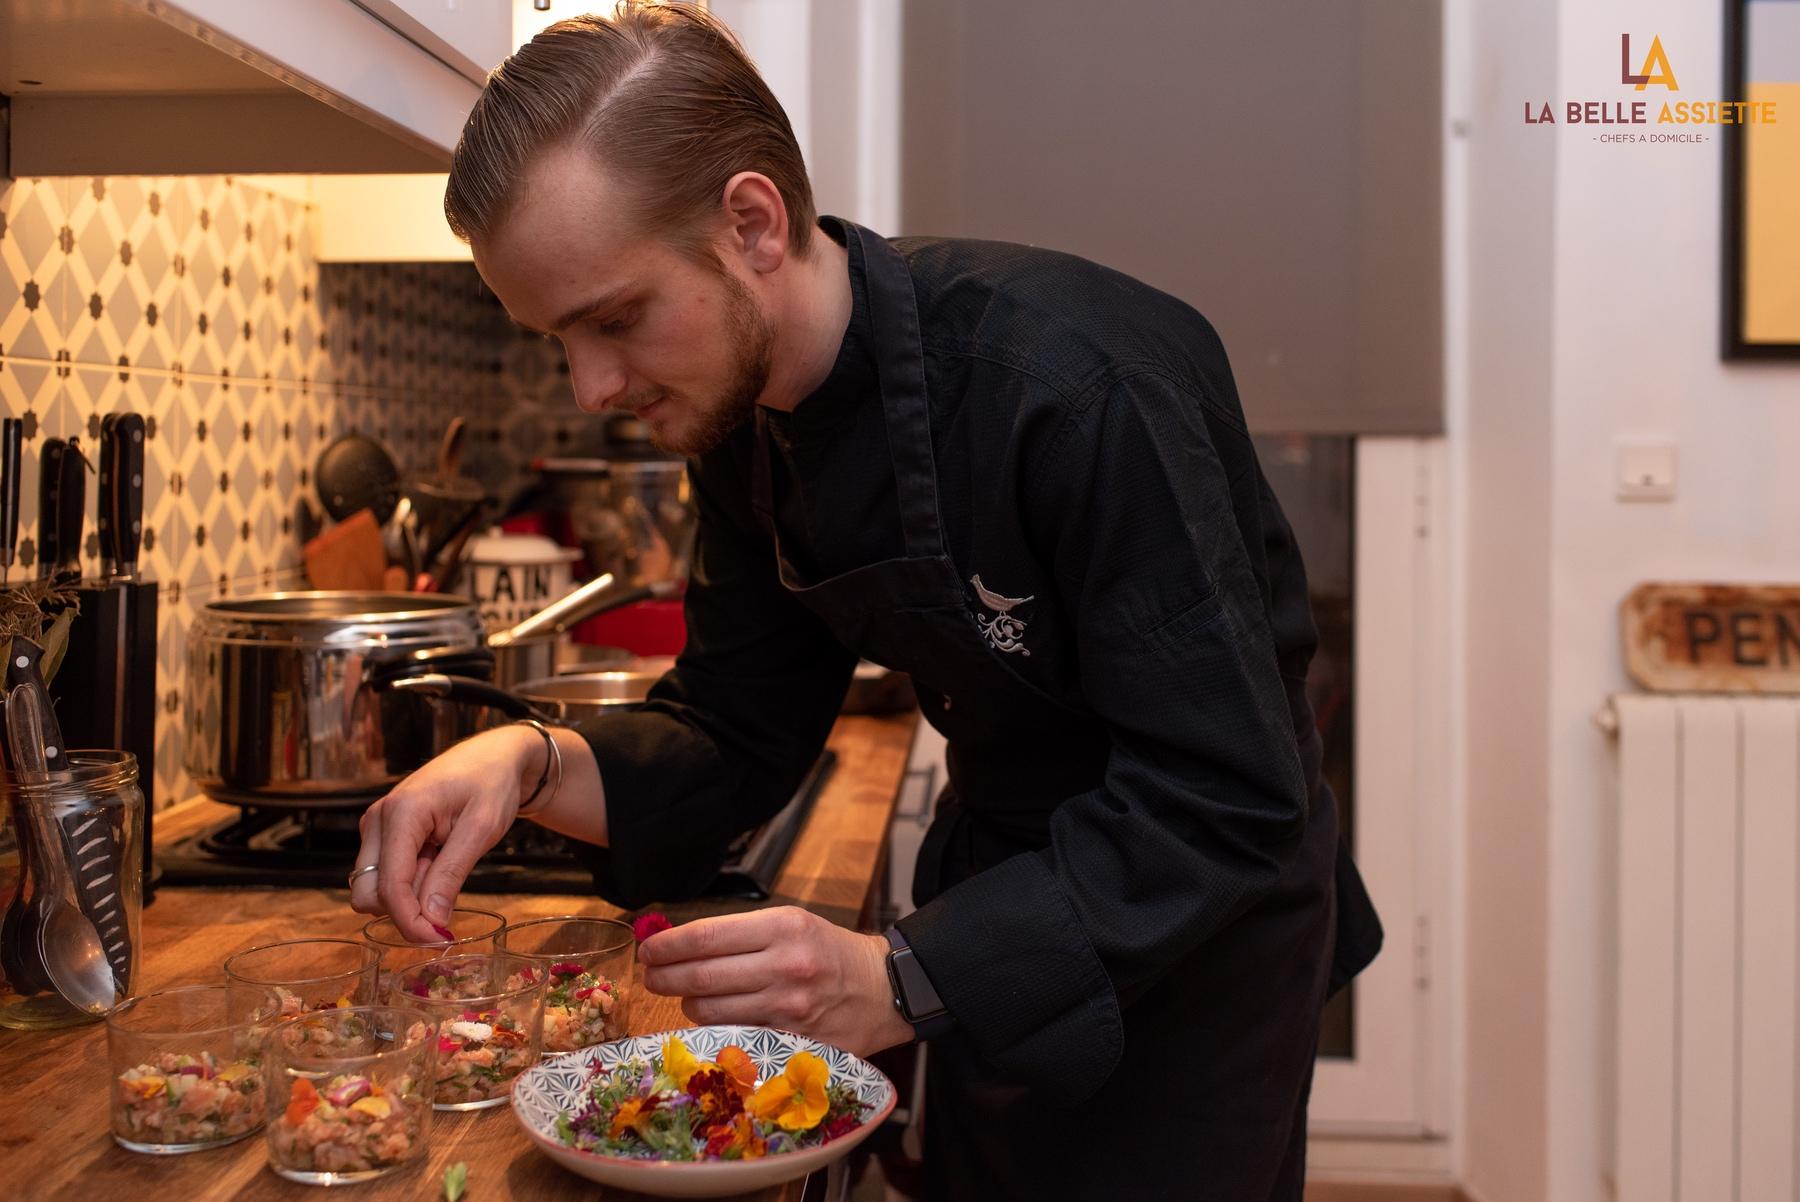 Loris-Bianchi-D-Chef-Cooking-5.jpg